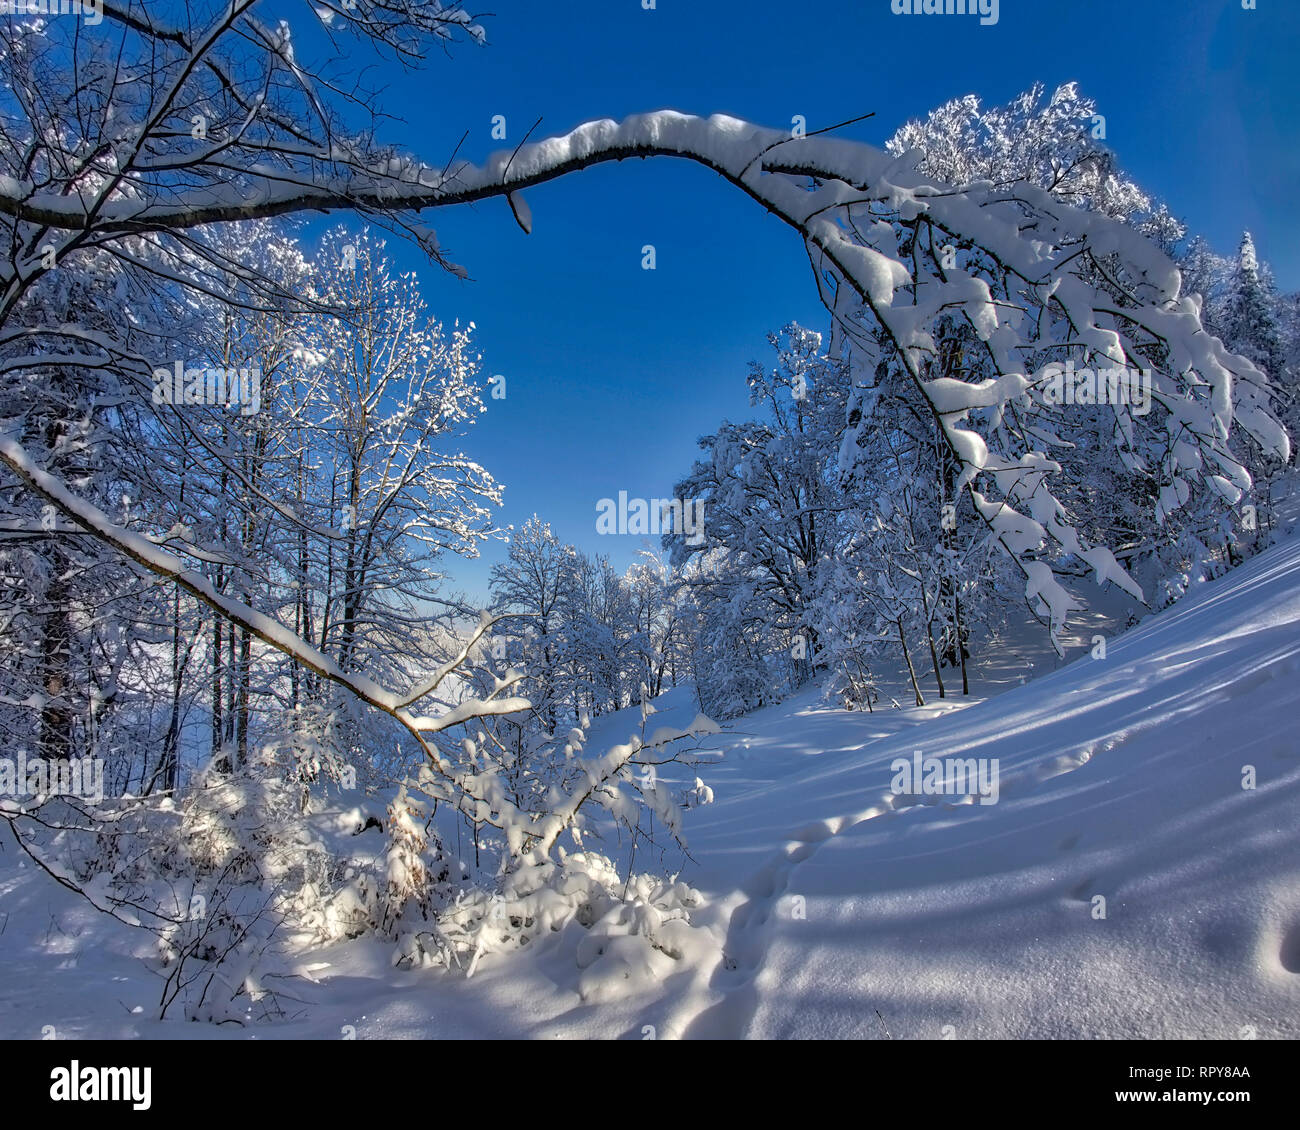 DE - BAVARIA: Winterscene on Kalvarienberg at Bad Tölz  (HDR-Image) Stock Photo